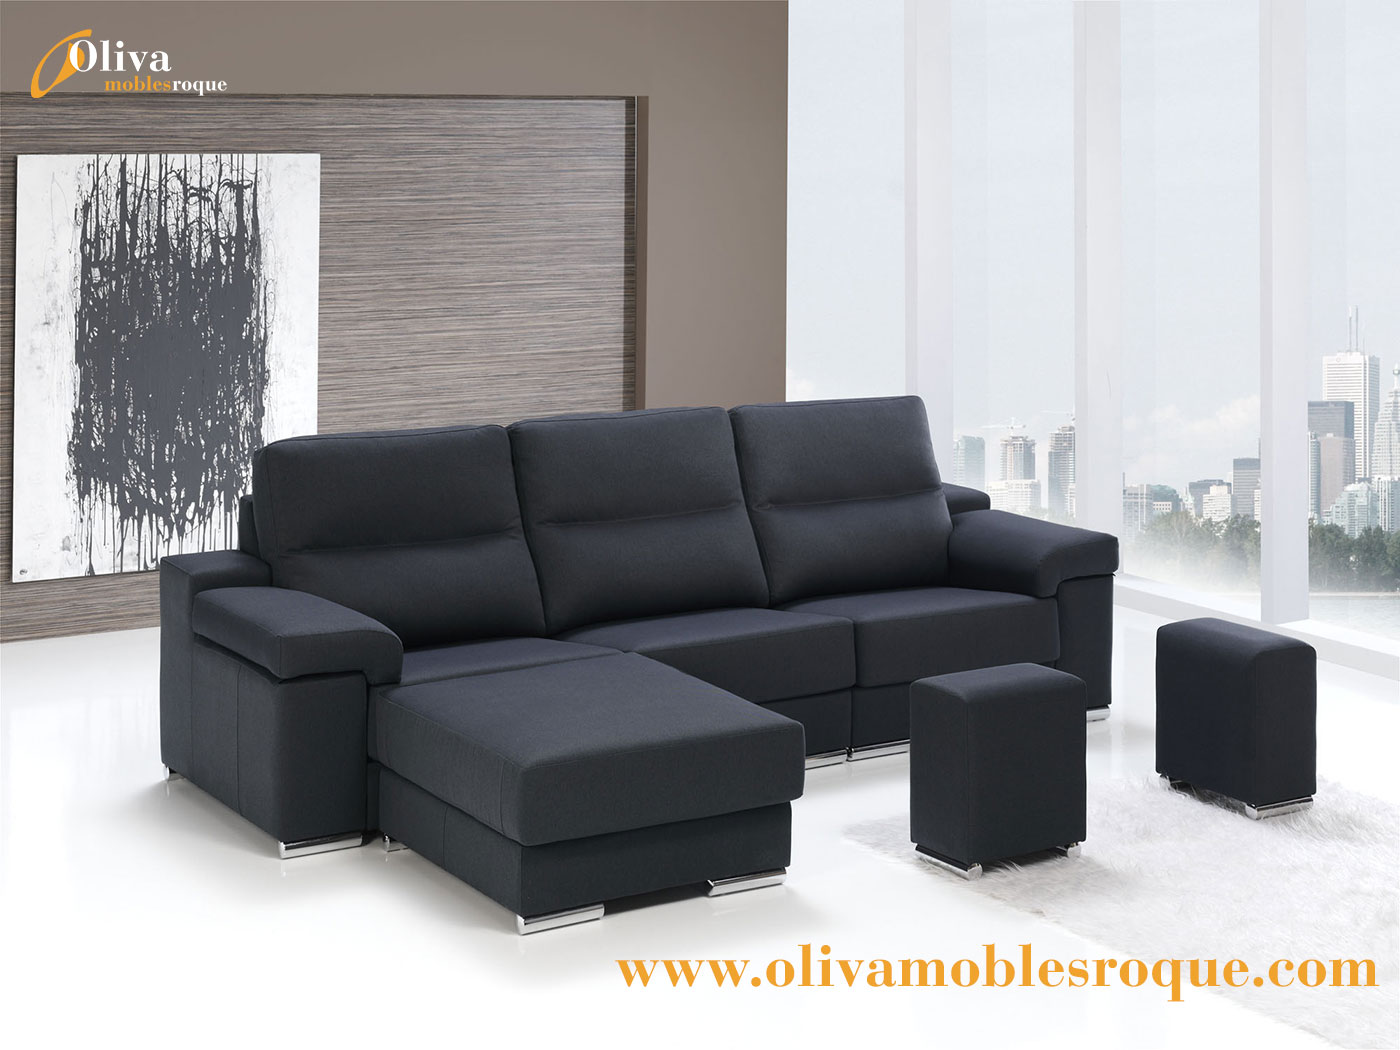 Cat logo de tapiceria chaiselonge sofas 3 2 sillones - Tapizados navarro ...